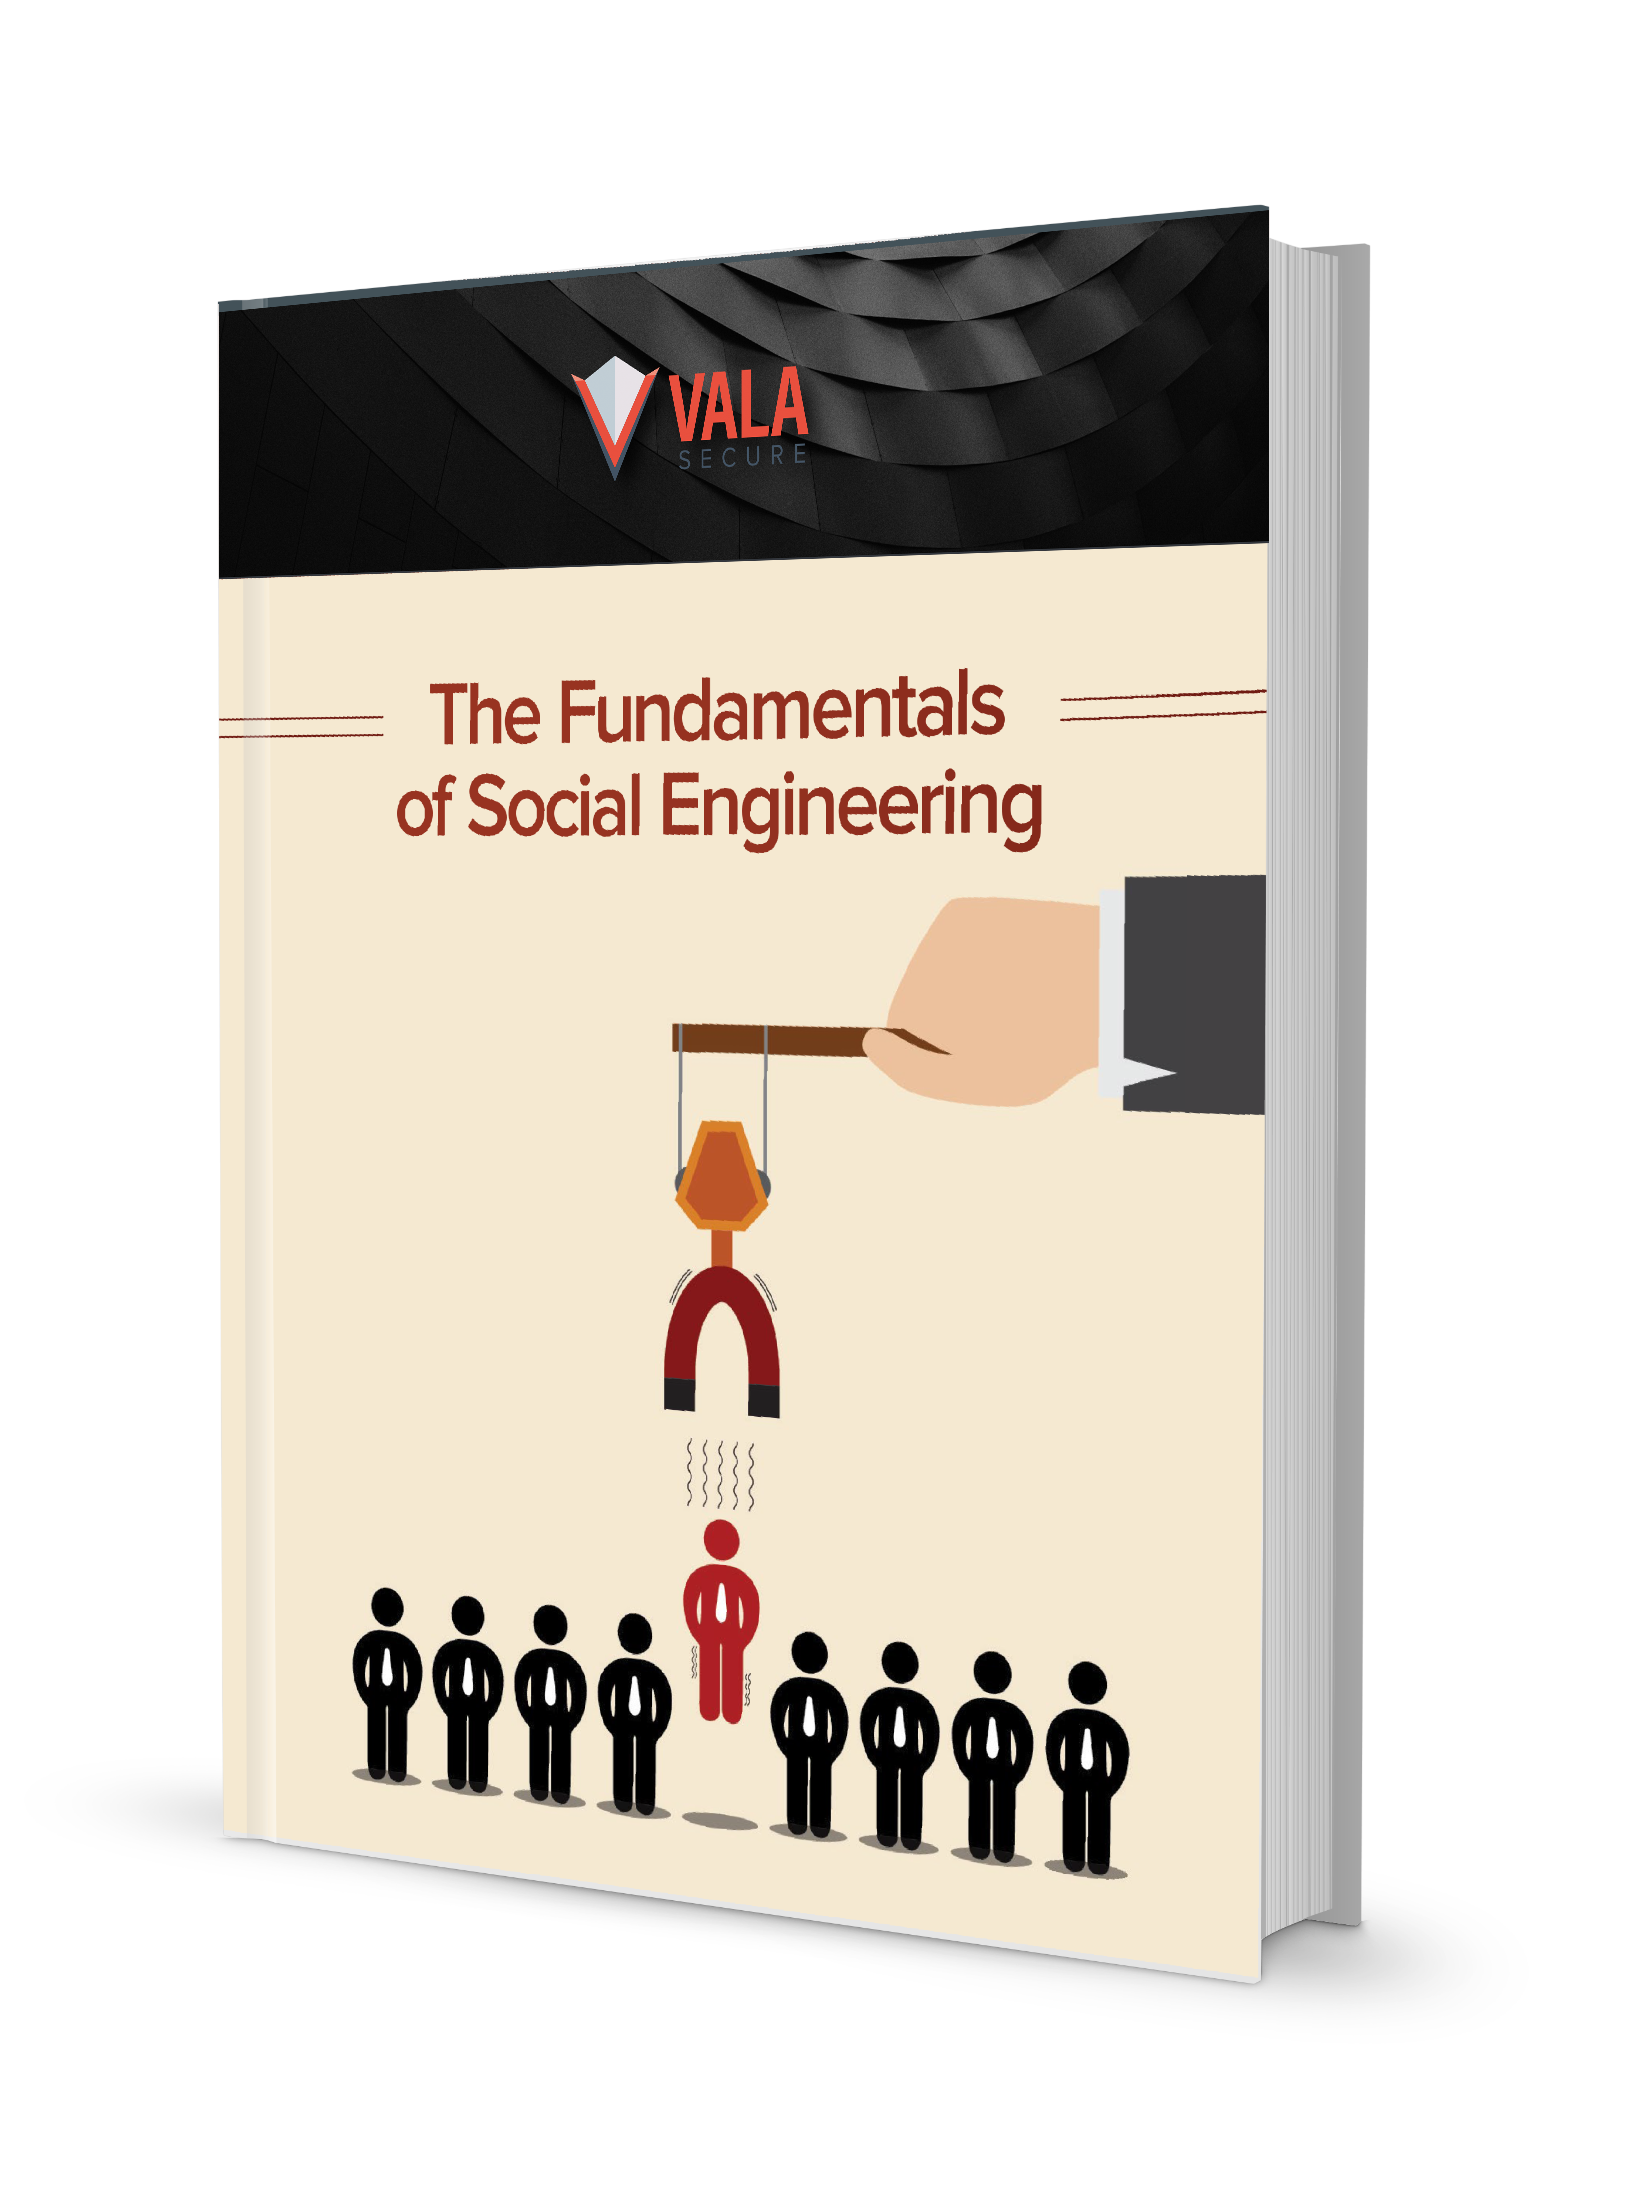 SocialEngineeringeBook-mockup-1